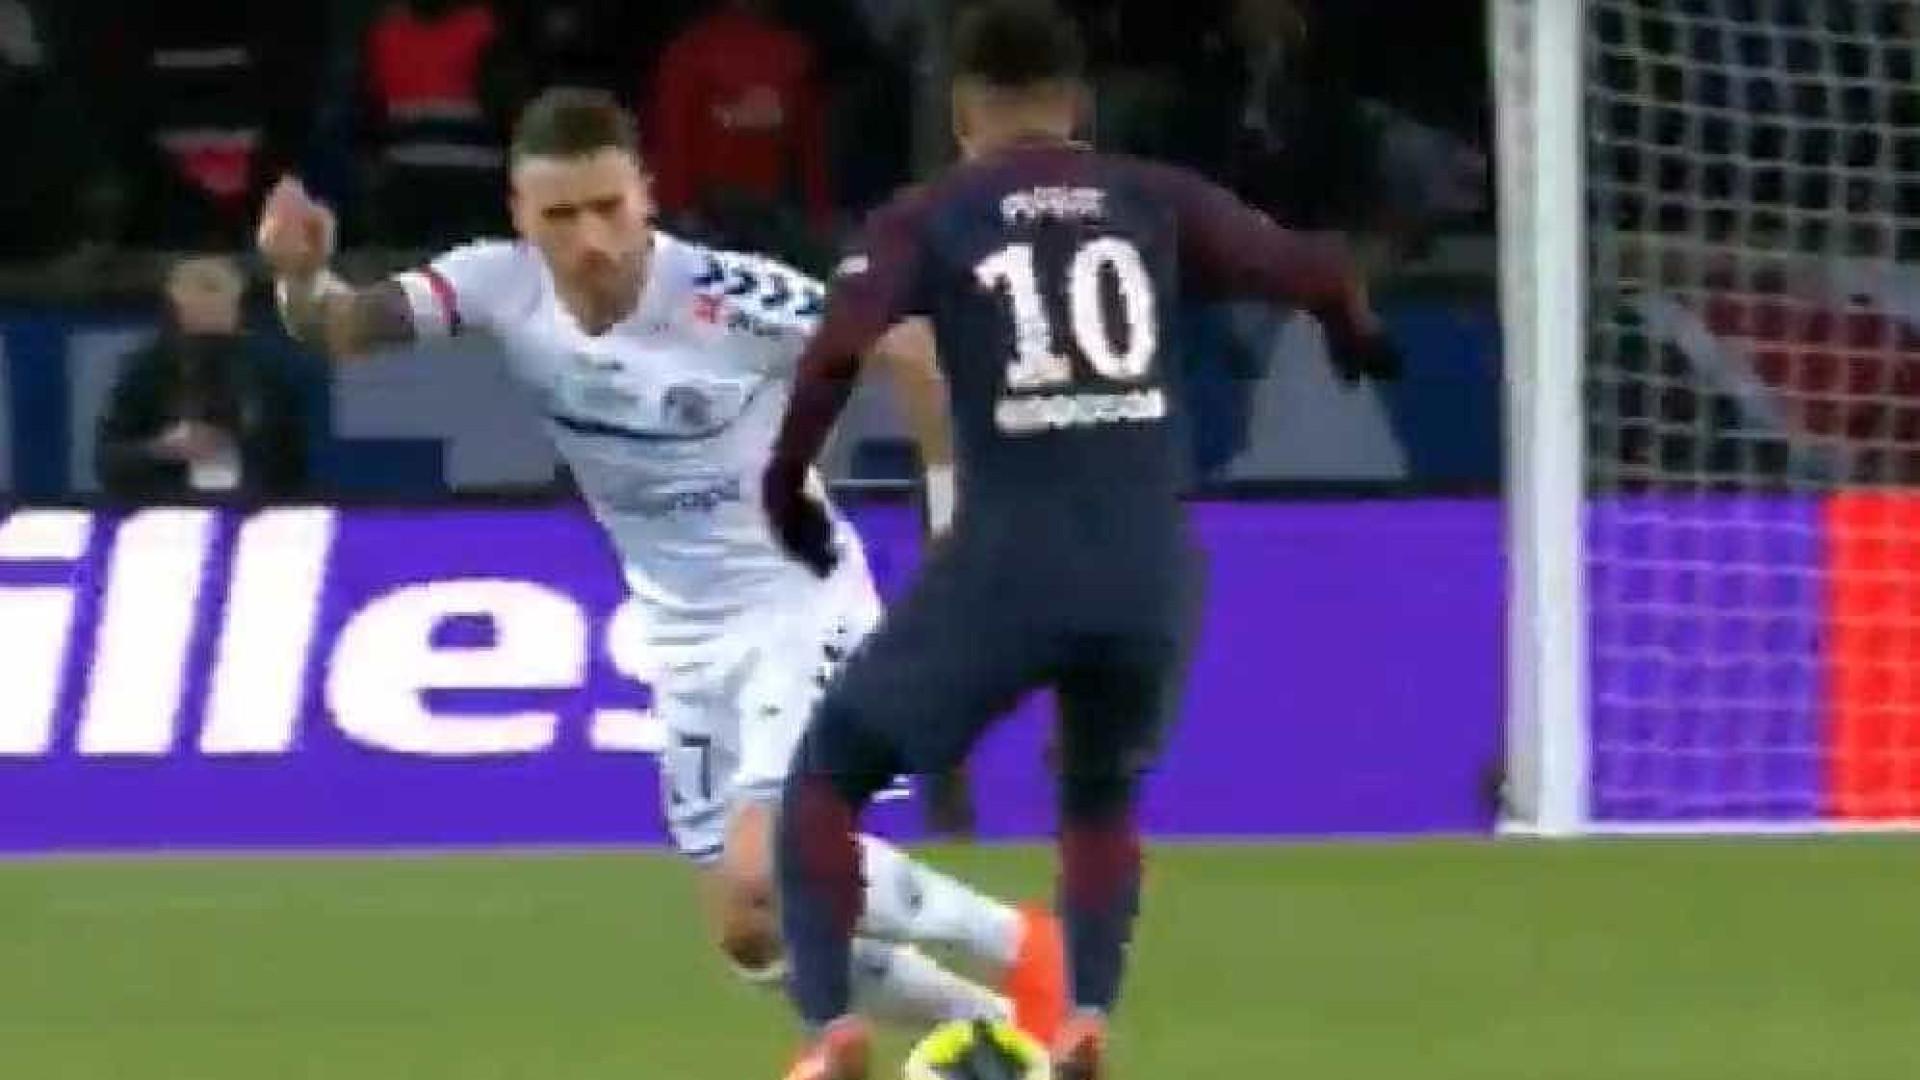 Fantástico lance no PSG-Estrasburgo: Desta vez Neymar abusou